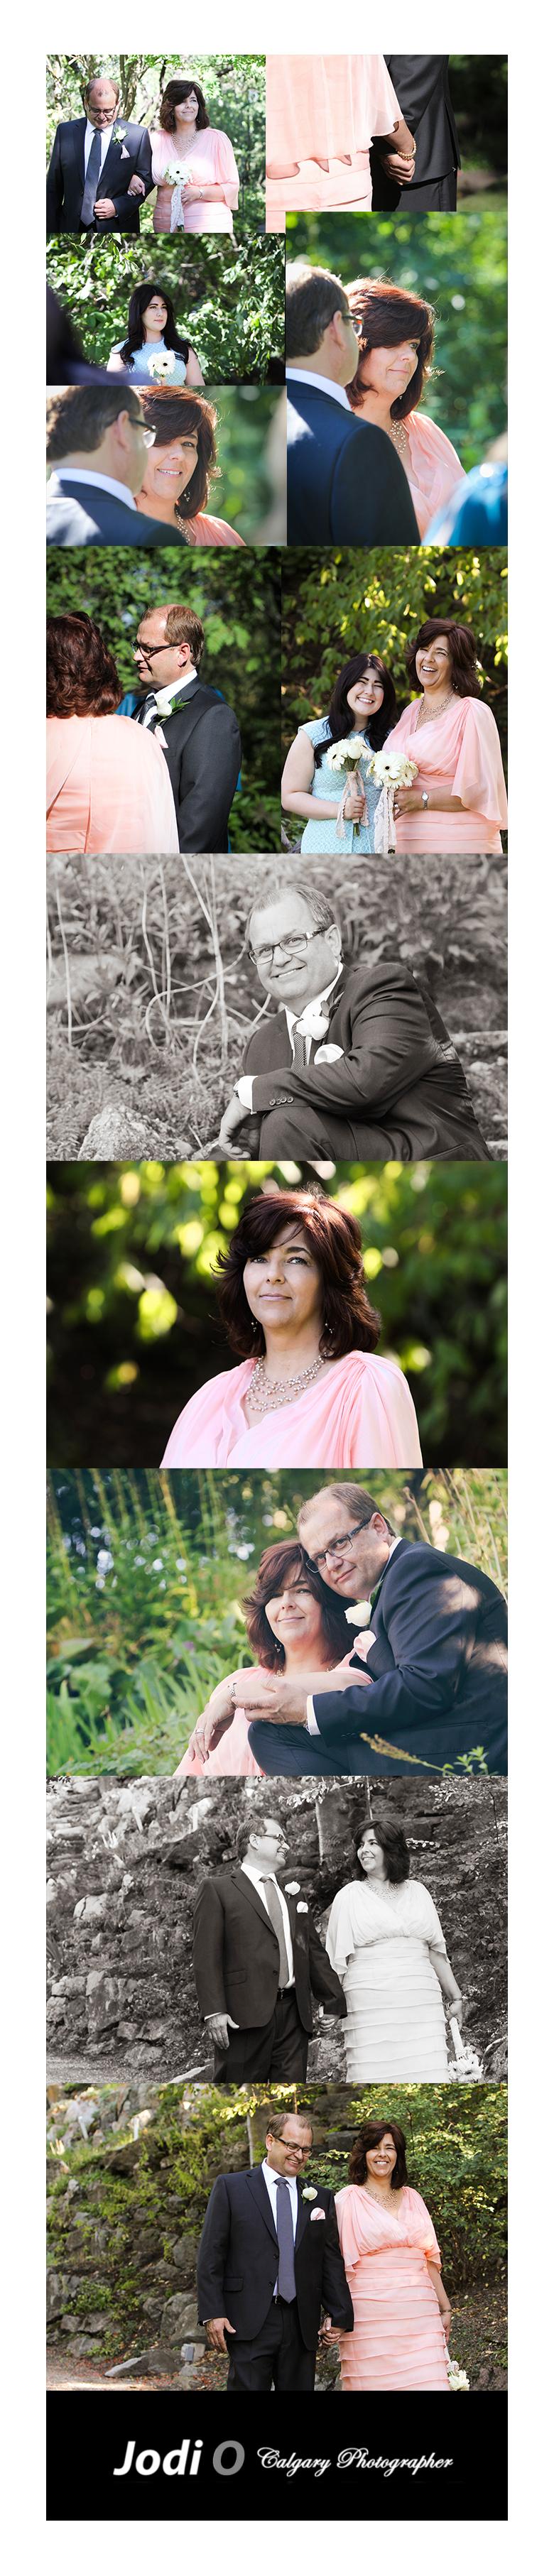 Affordable wedding photography calgary